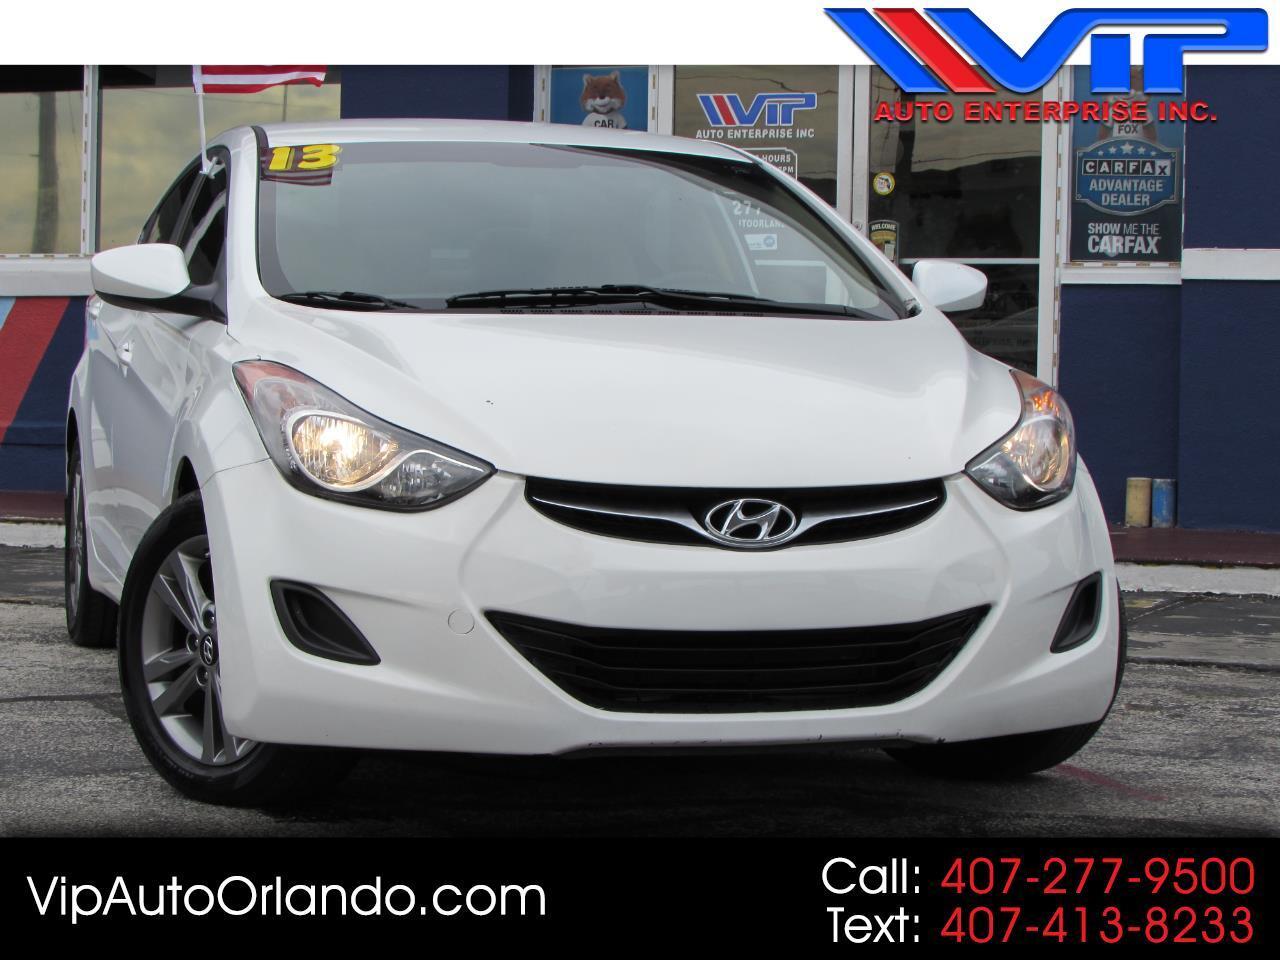 2013 Hyundai Elantra 4dr Sdn Auto GLS (Alabama Plant) *Ltd Avail*